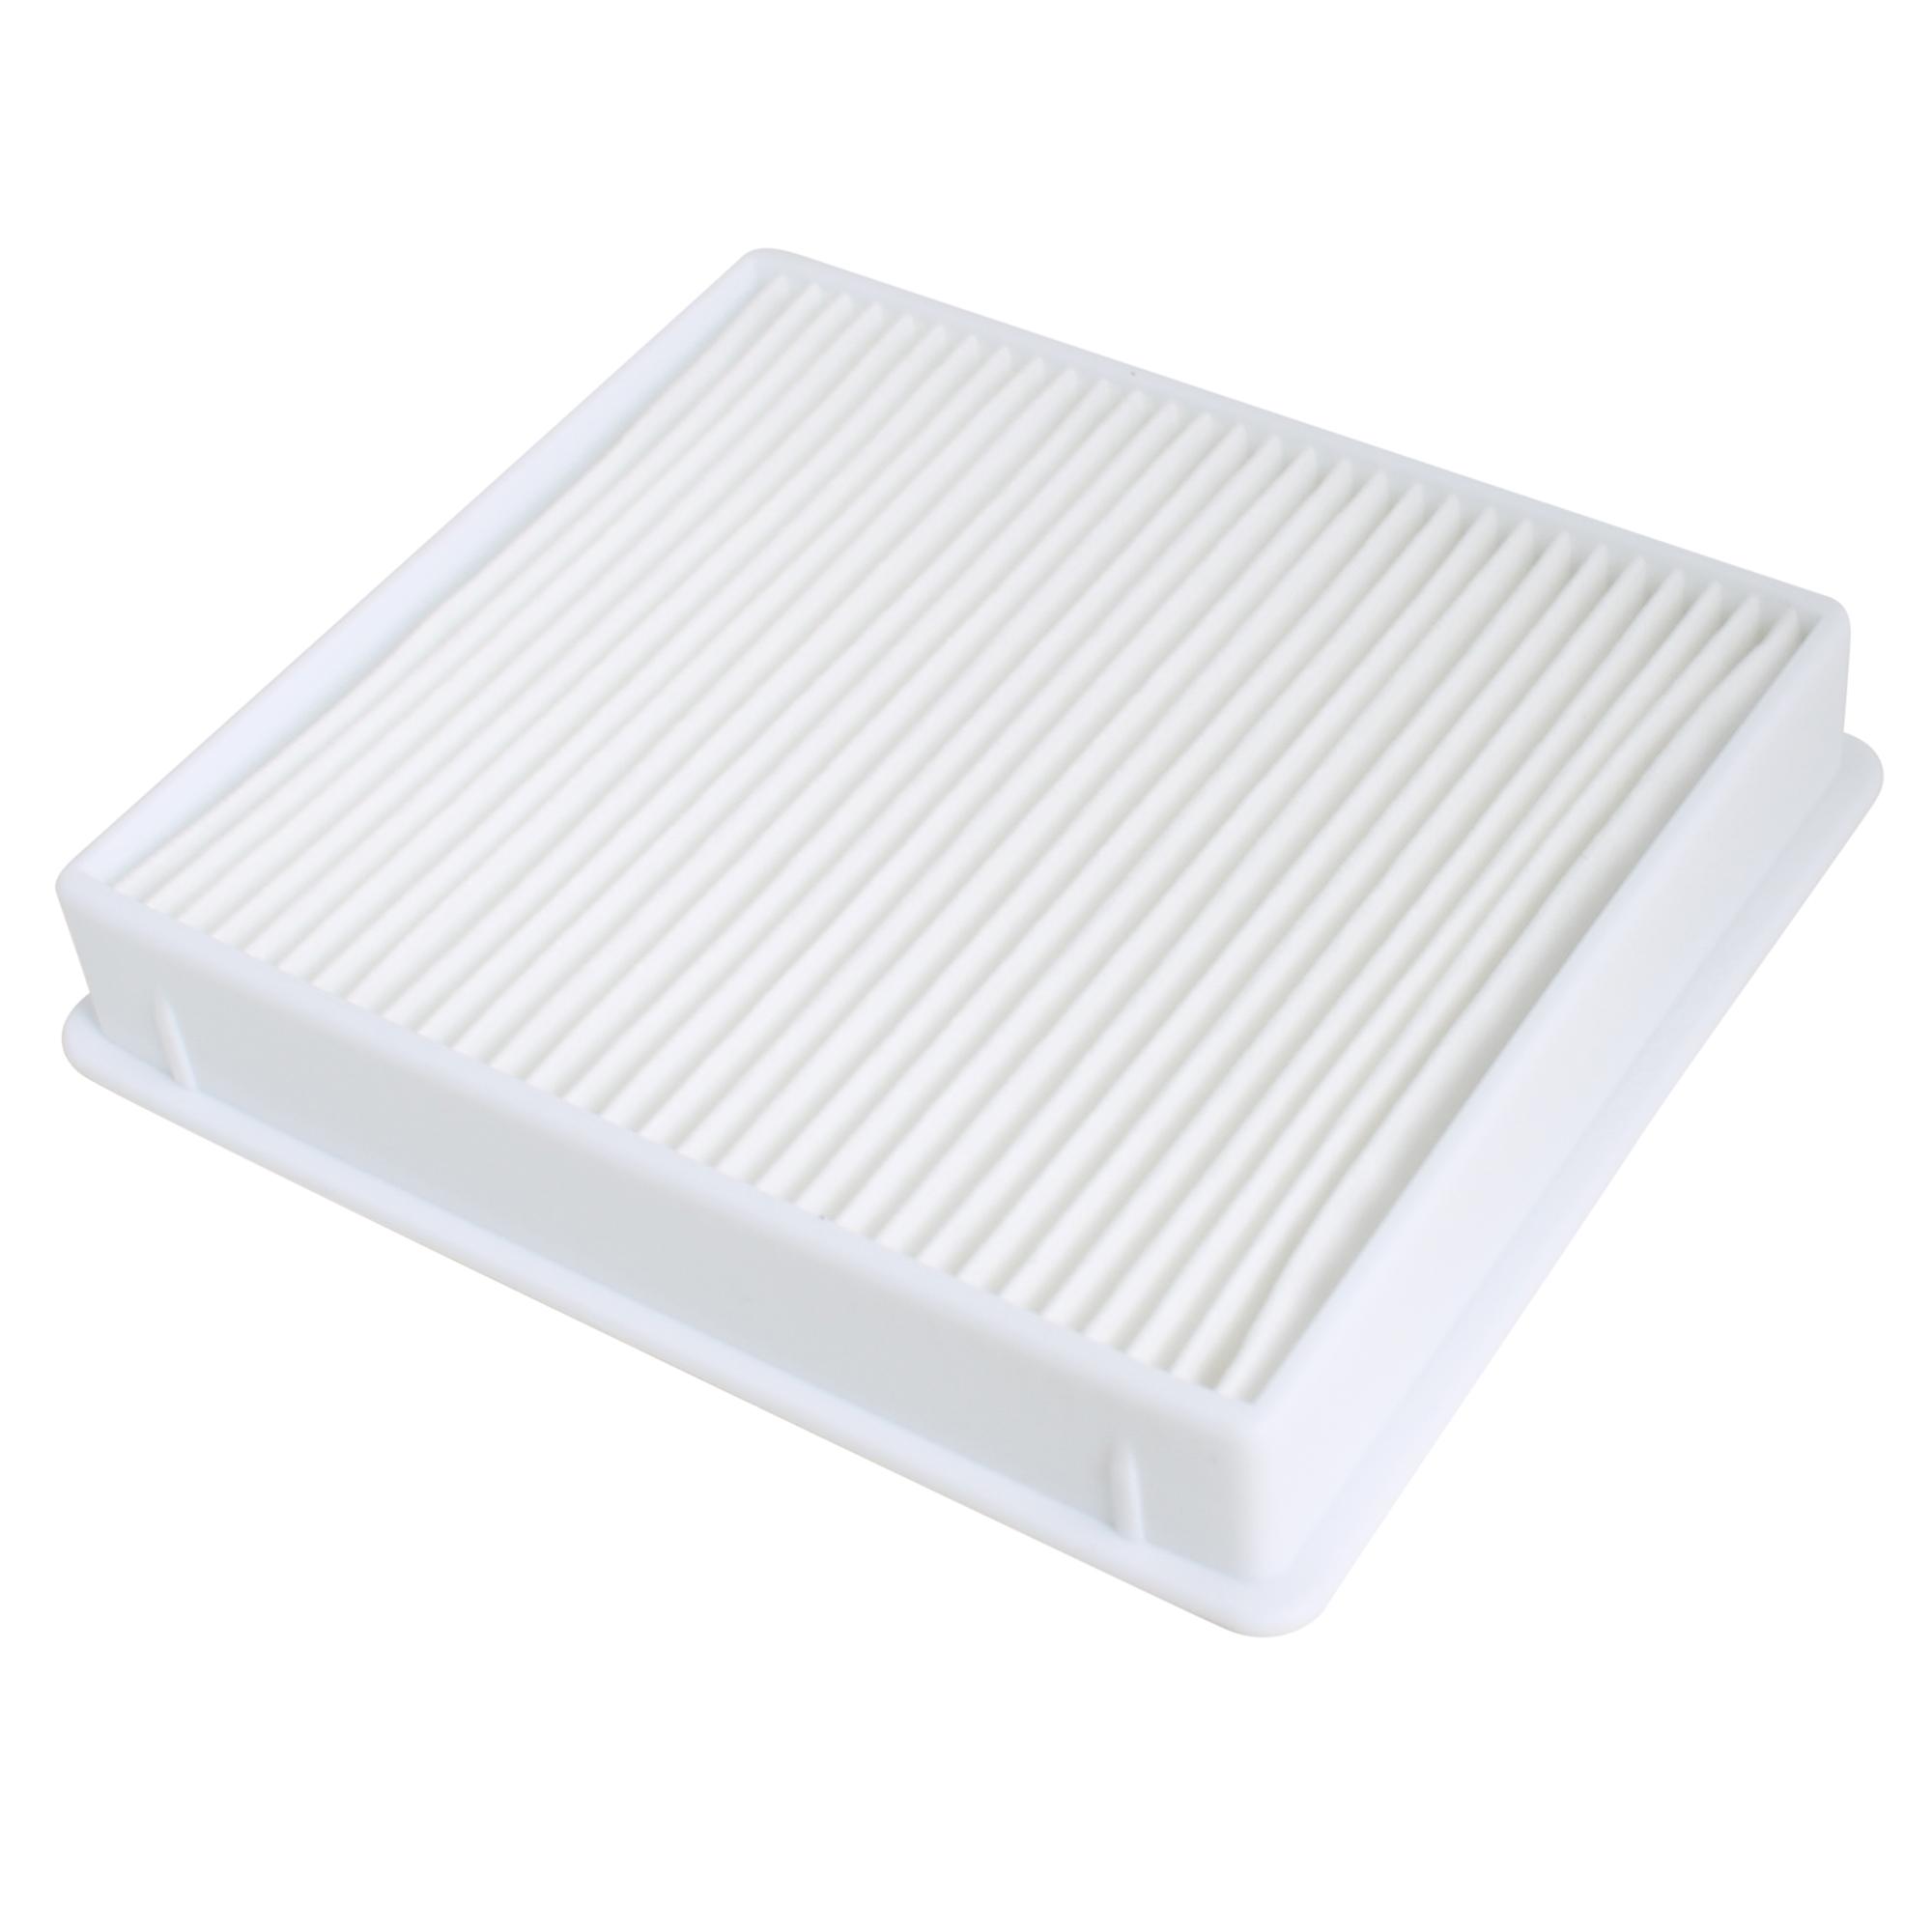 Accessoire aspirateur samsung air track - Filtre aspirateur samsung sc4780 ...